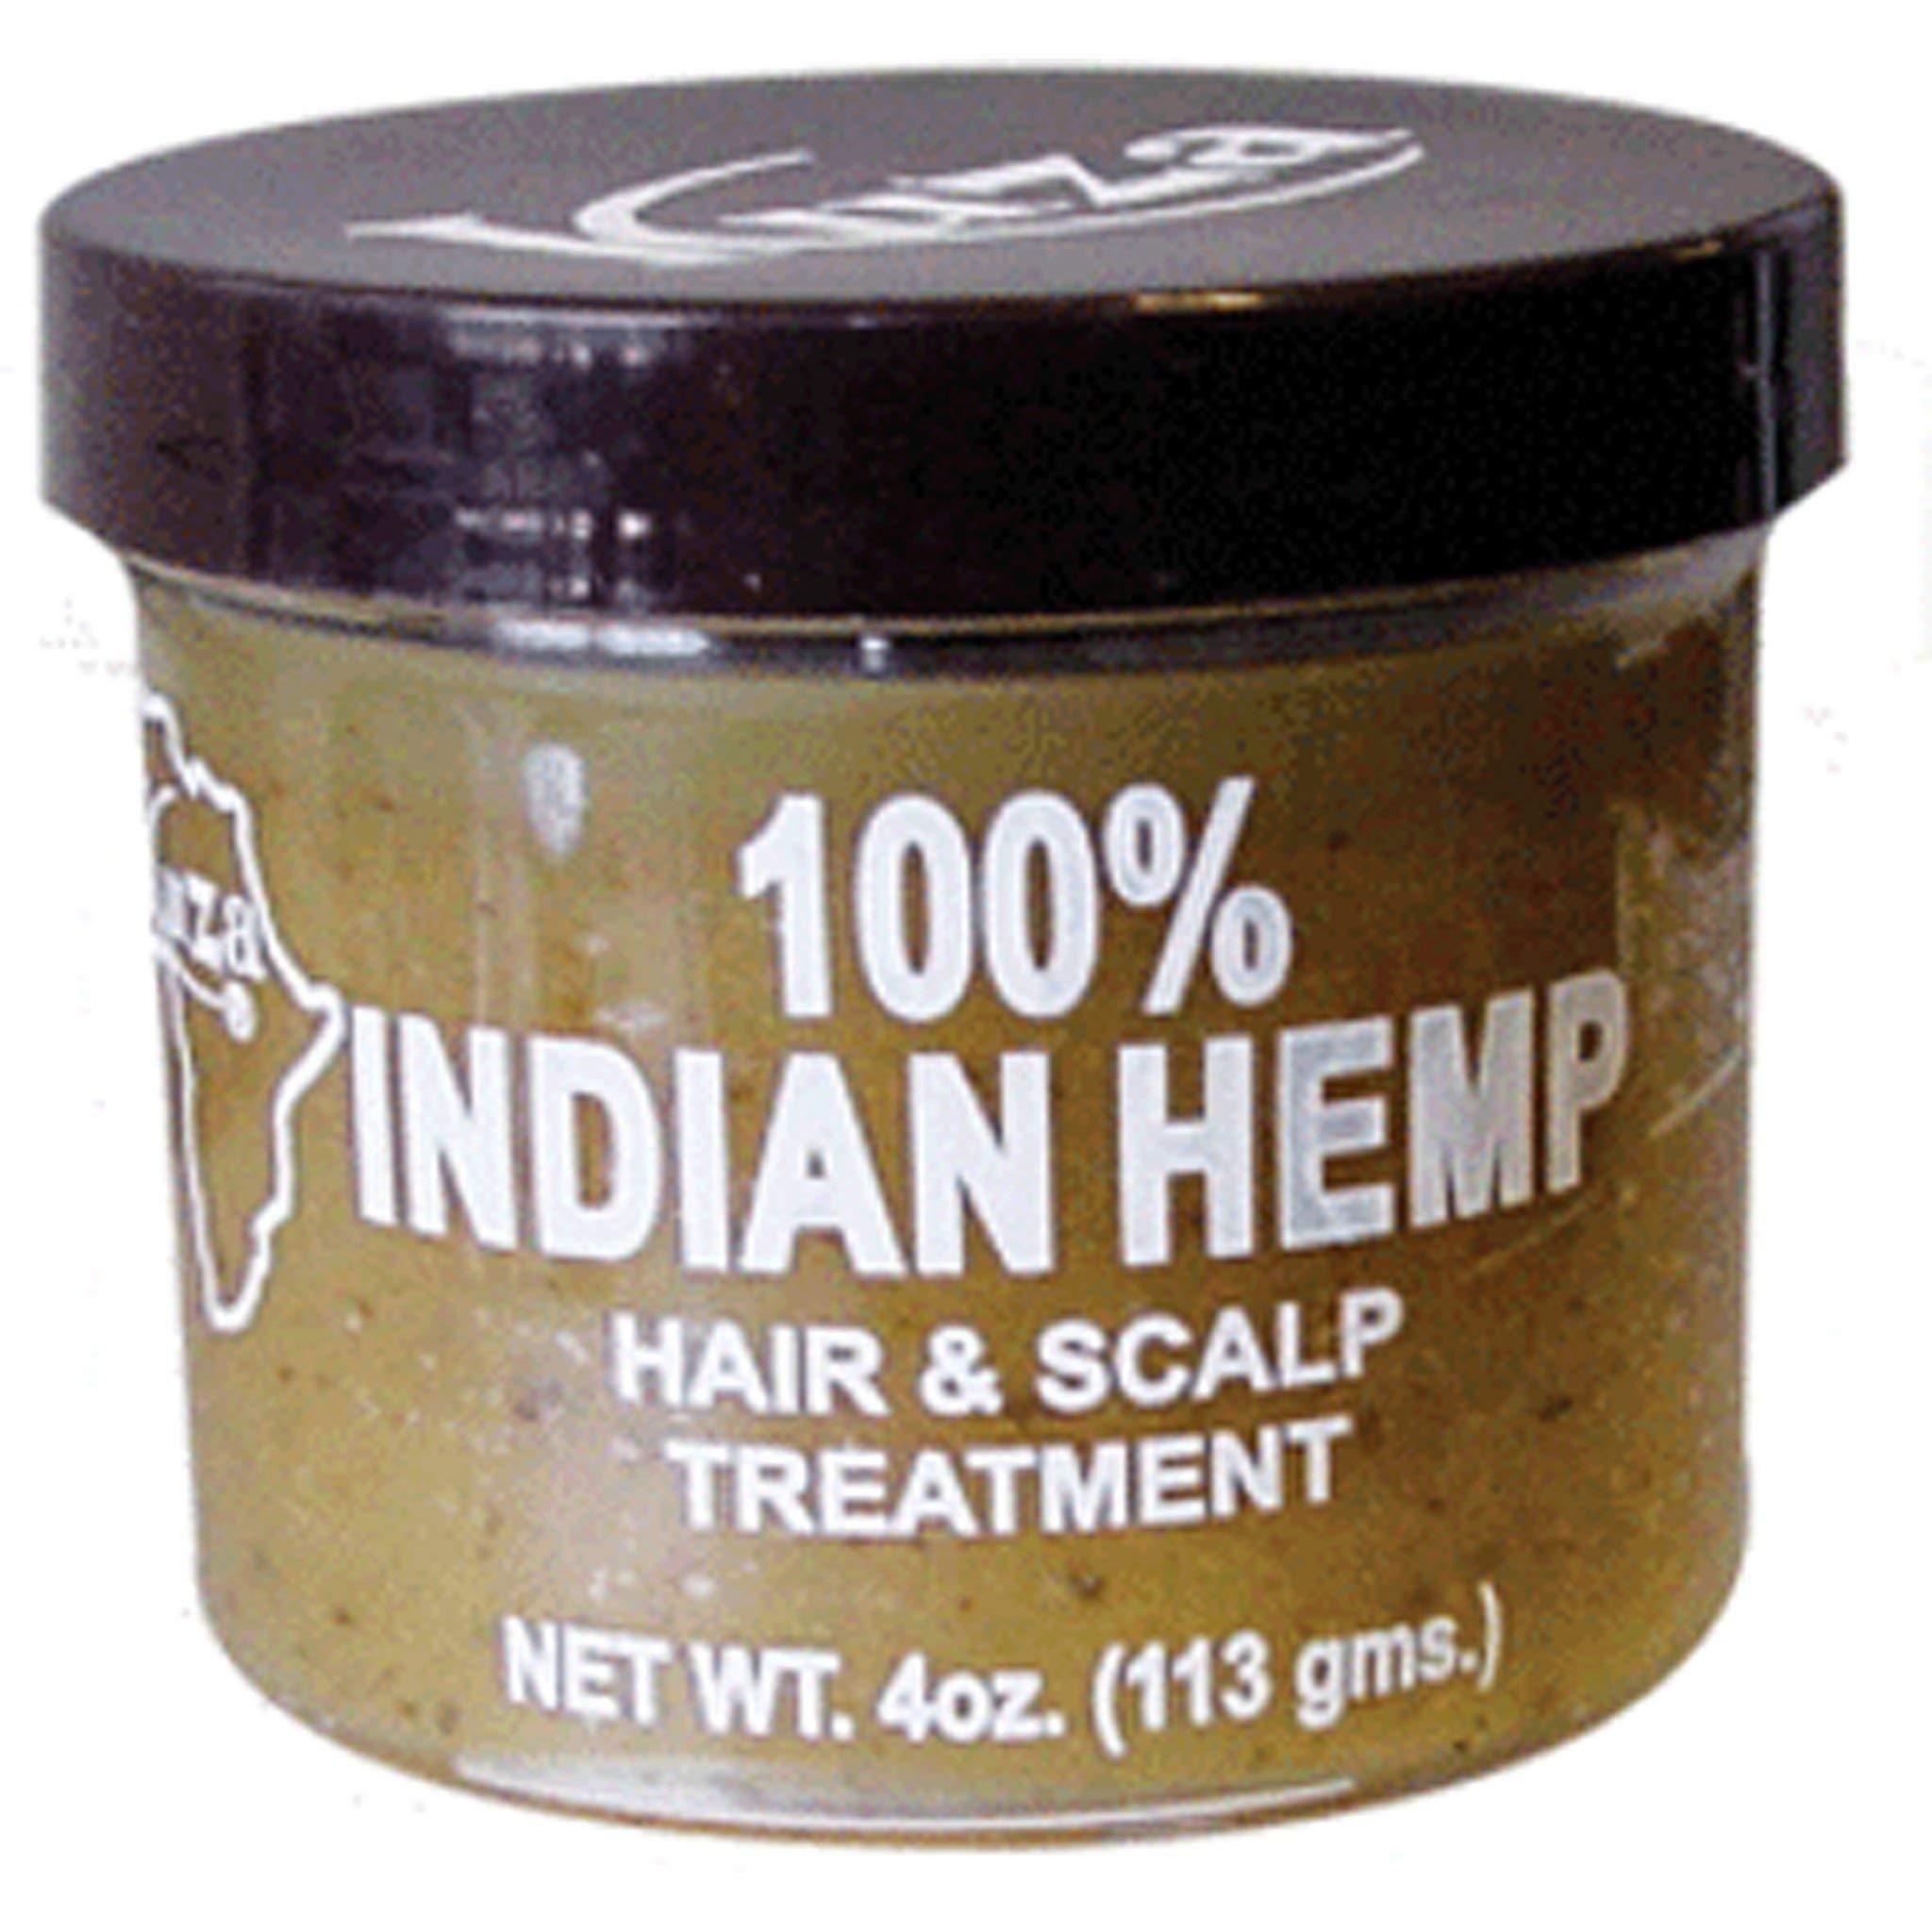 Kuza 100% Indian Hemp Hair & Scalp Treatment 4oz